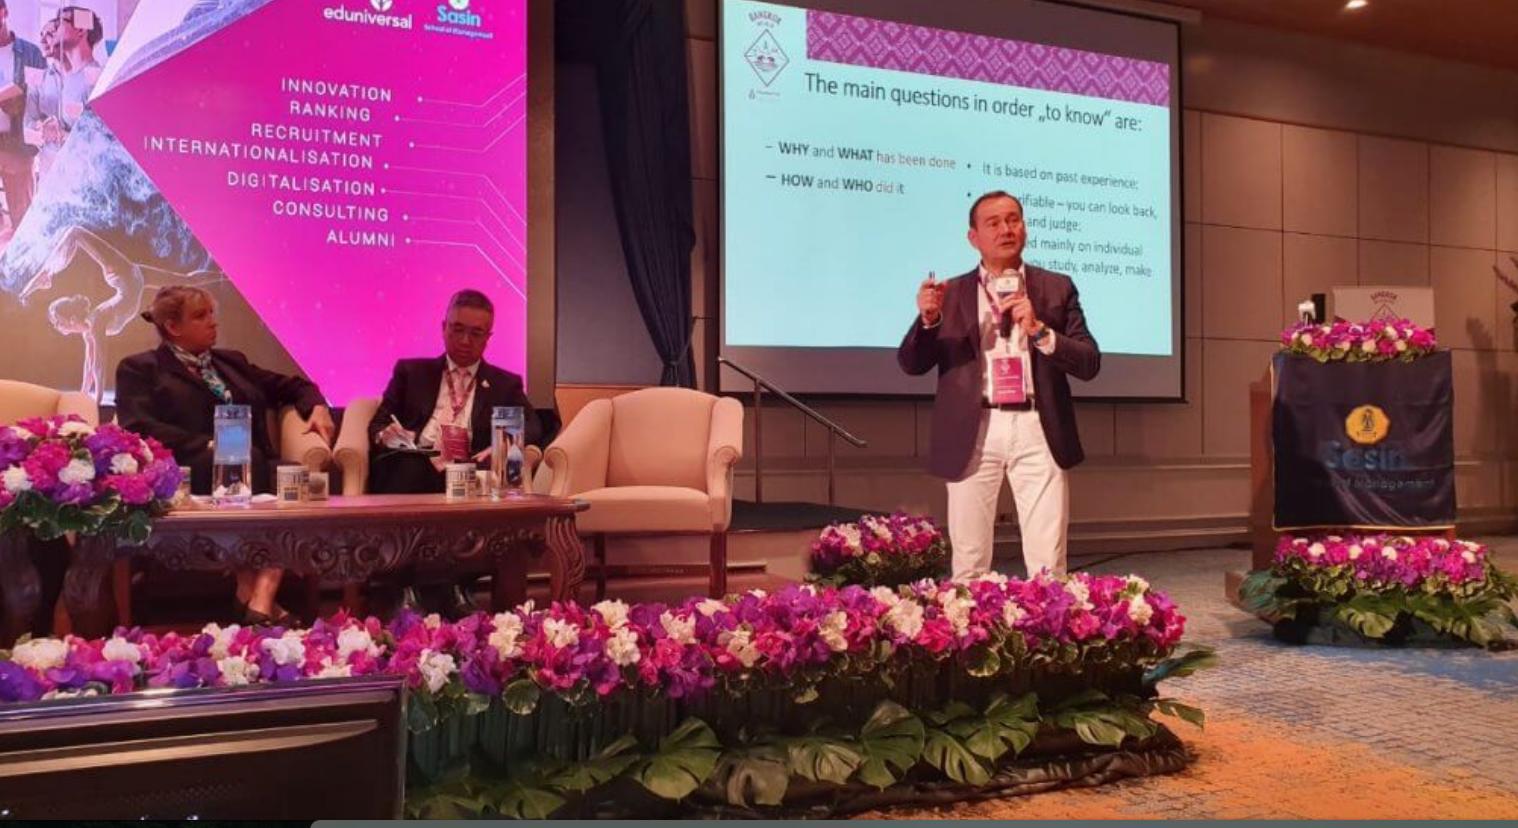 BMDA President at Eduniversal World Convention